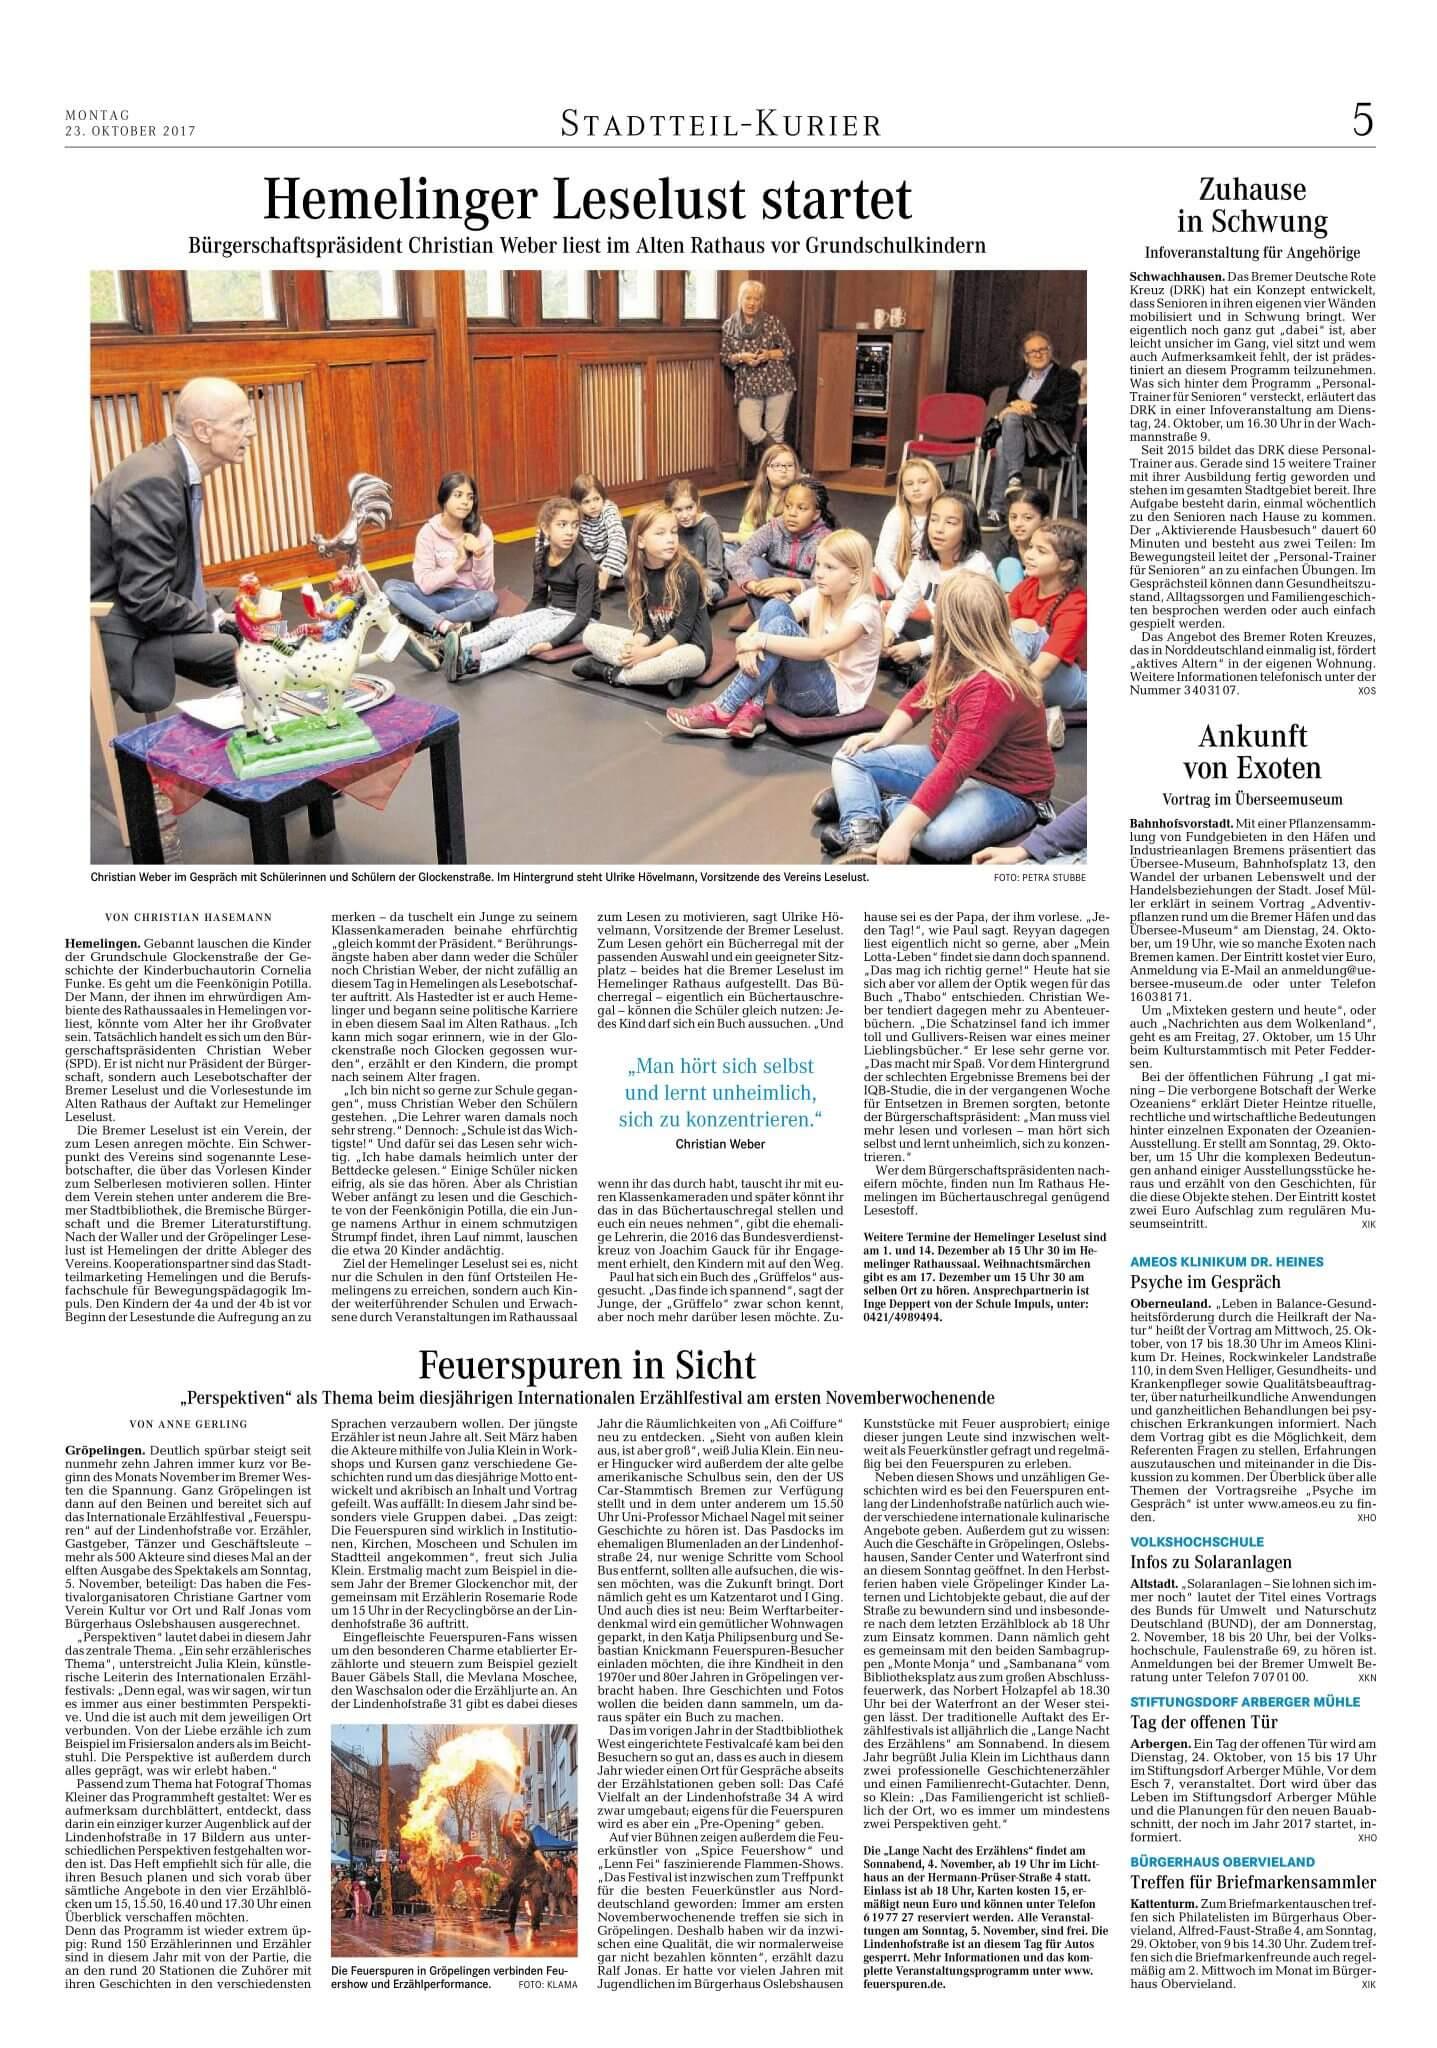 Hemelinger Leselust startet Bürgerschaftspräsident Christian Weber liest im Alten Rathaus vor Grundschulkindern - Stadt-teil Kurier Bremen 23 Oktober 2017 BremerLeseLust